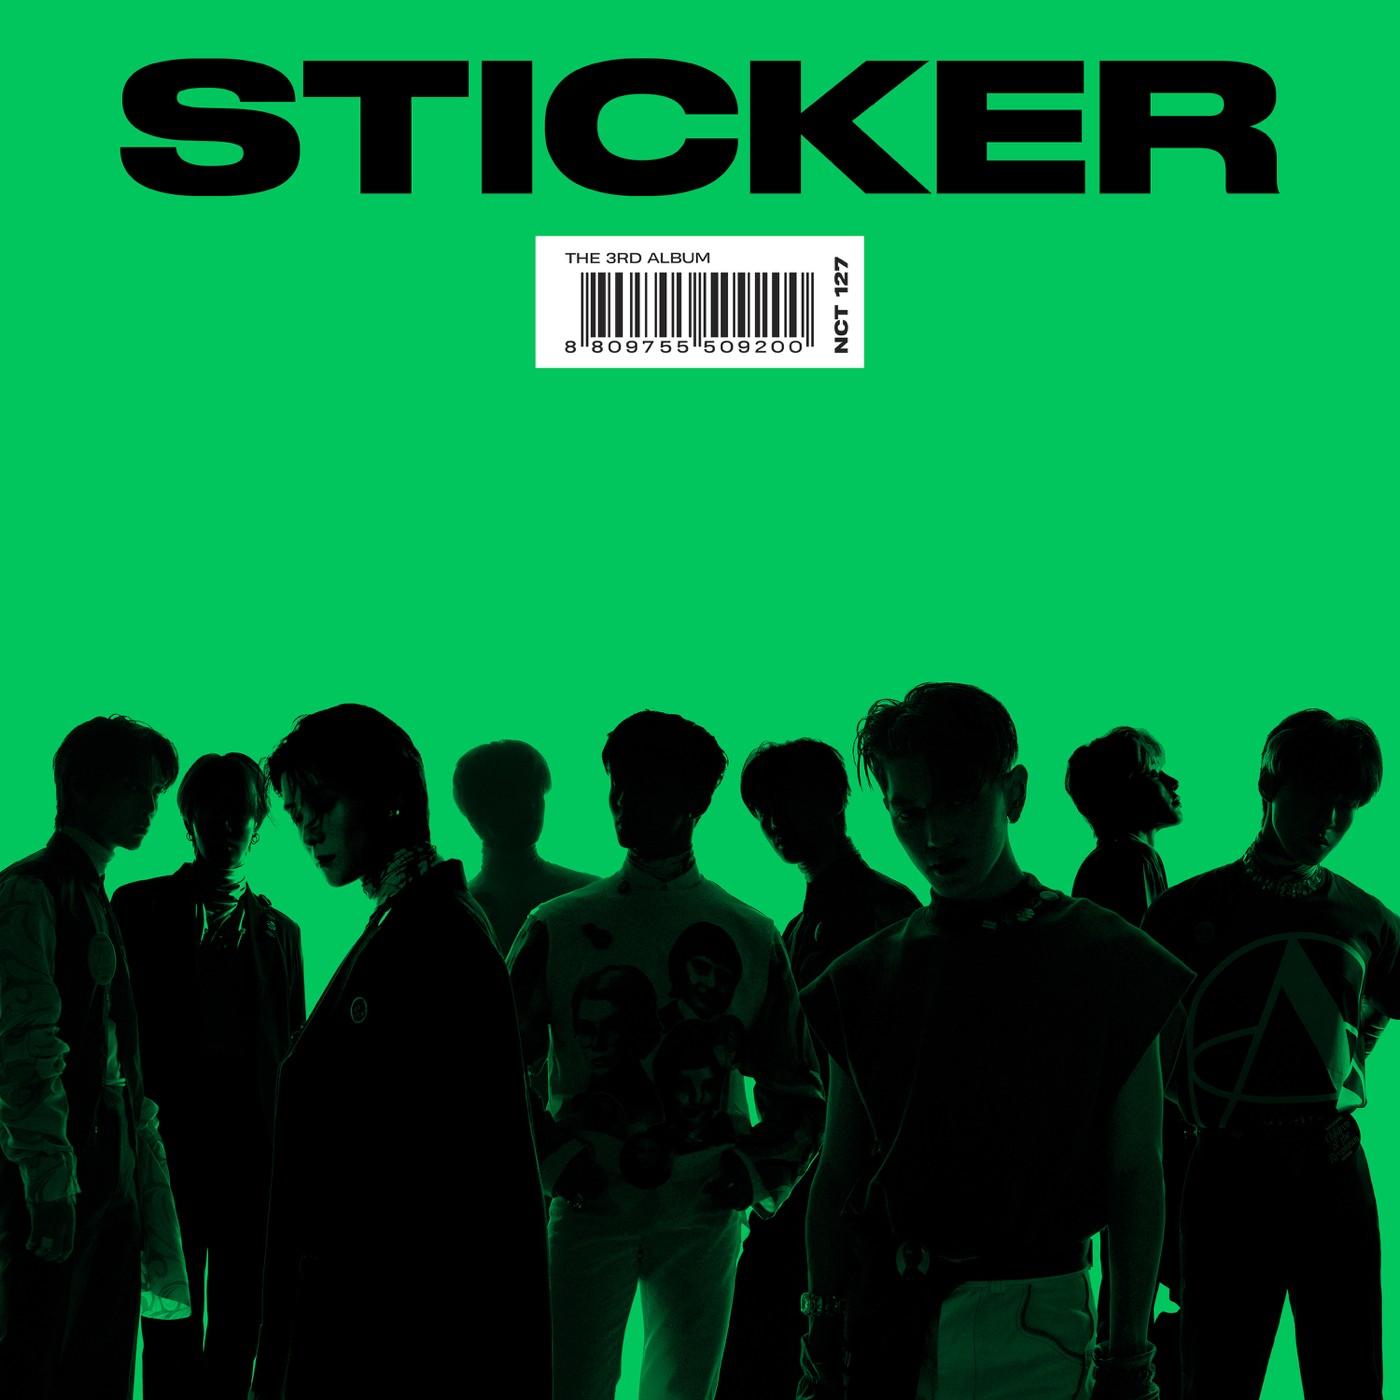 NCT 127 – Sticker – The 3rd Album [24bit Lossless + MP3 320 / WEB] [2021.09.17]